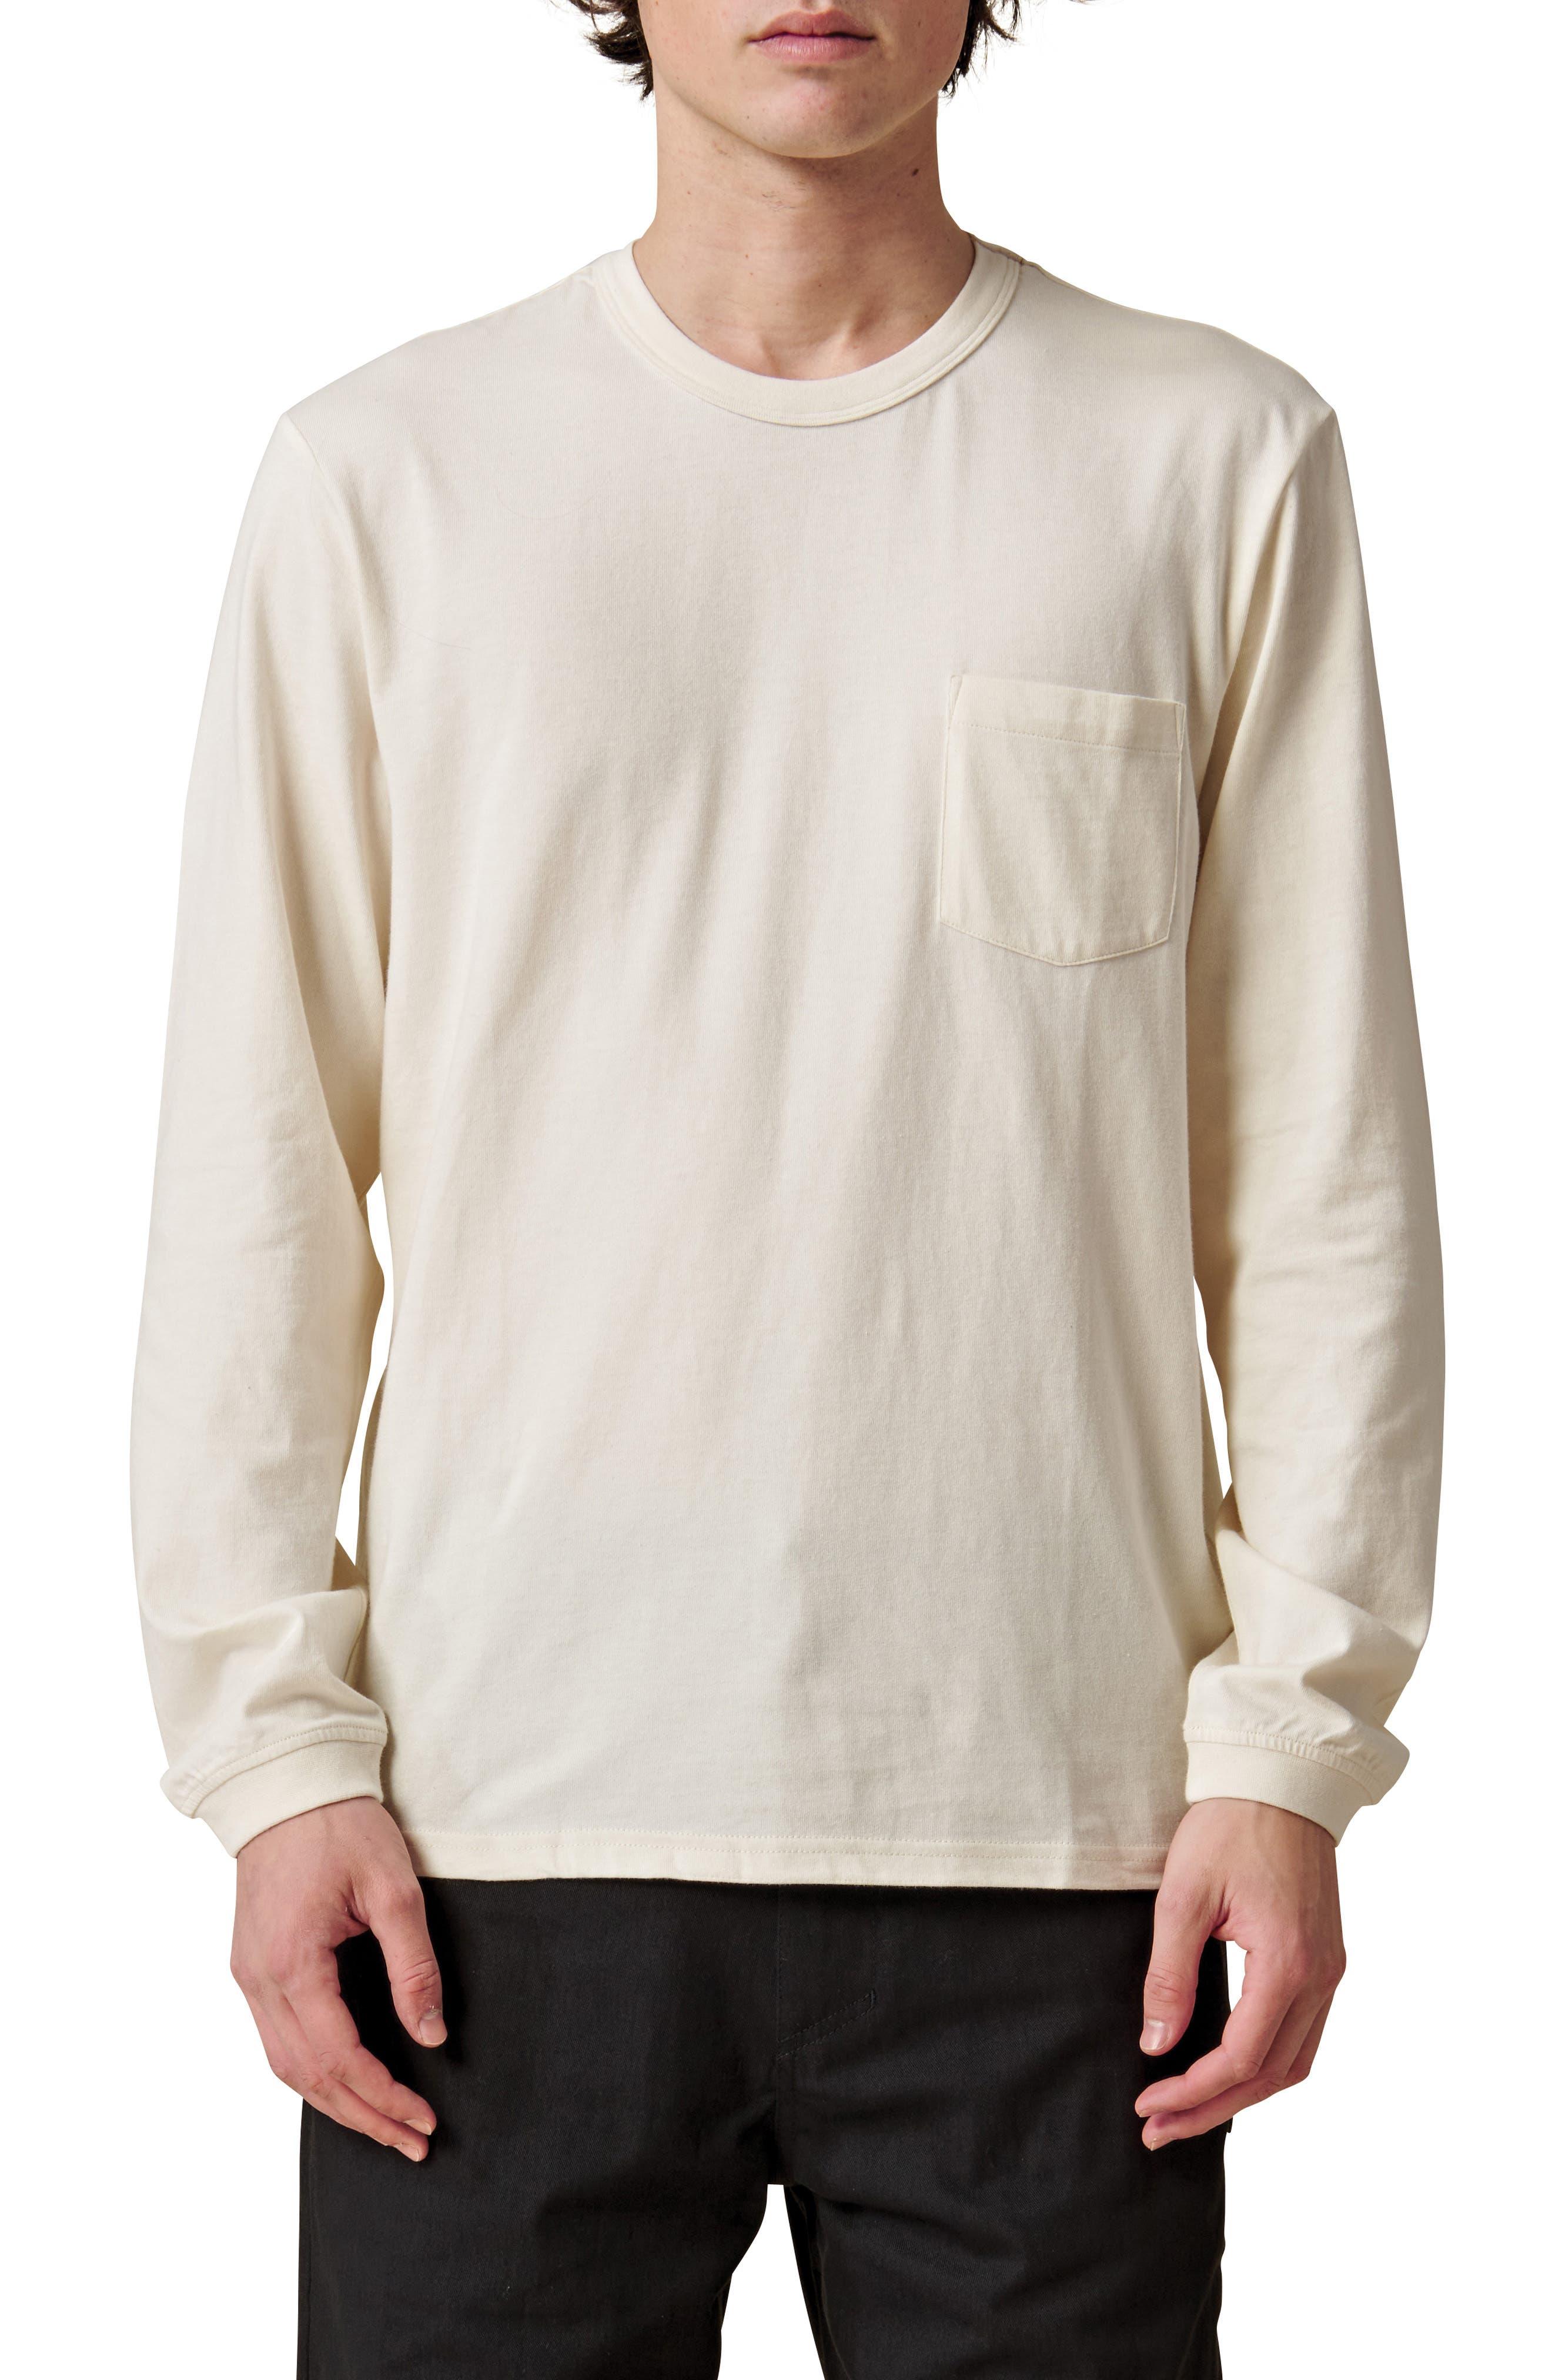 Every Damn Day Long Sleeve Pocket Organic Cotton T-Shirt